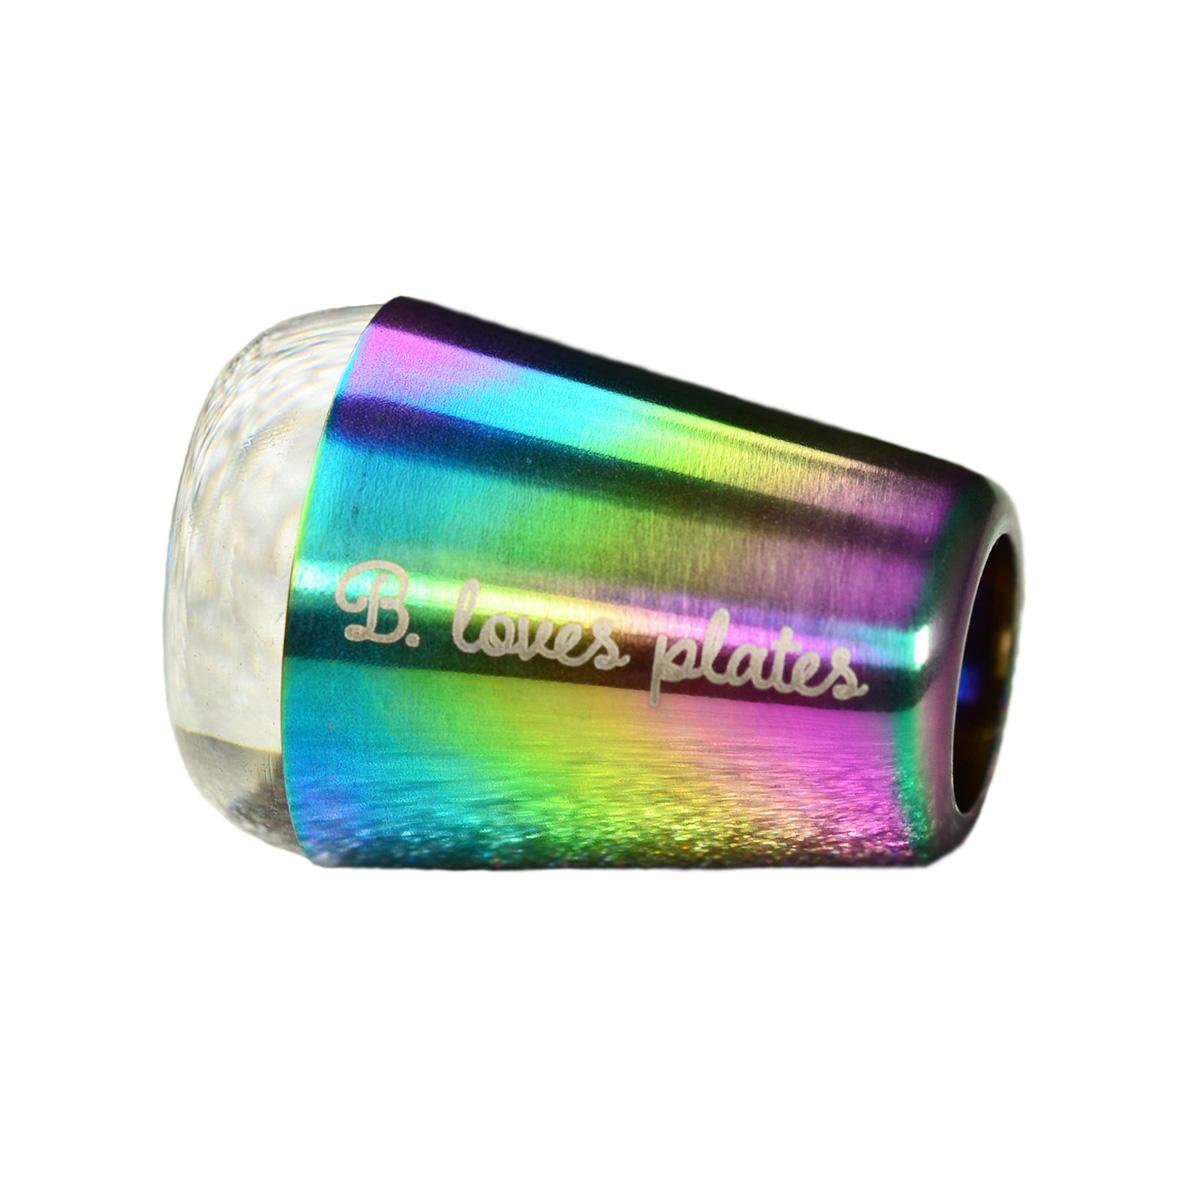 b-loves-plates-rainbow-stamper-jumbo-crystal-clear-plytki-stamping-nails-nail-art-stempelki-5